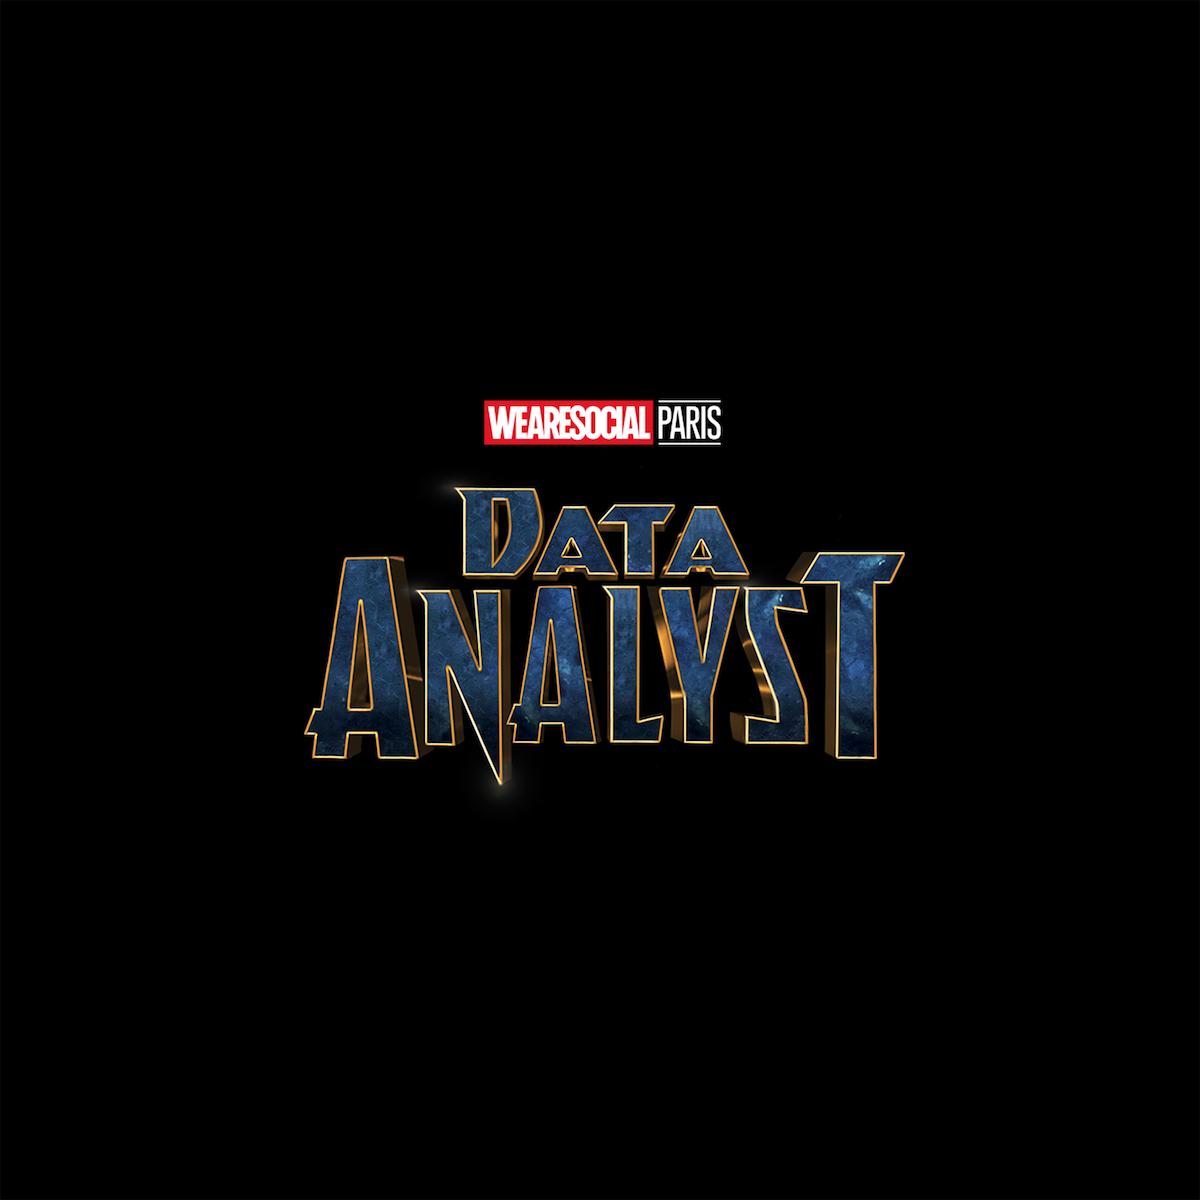 Superhero Logos for creative agency job titles - Data Analyst / Black Panther